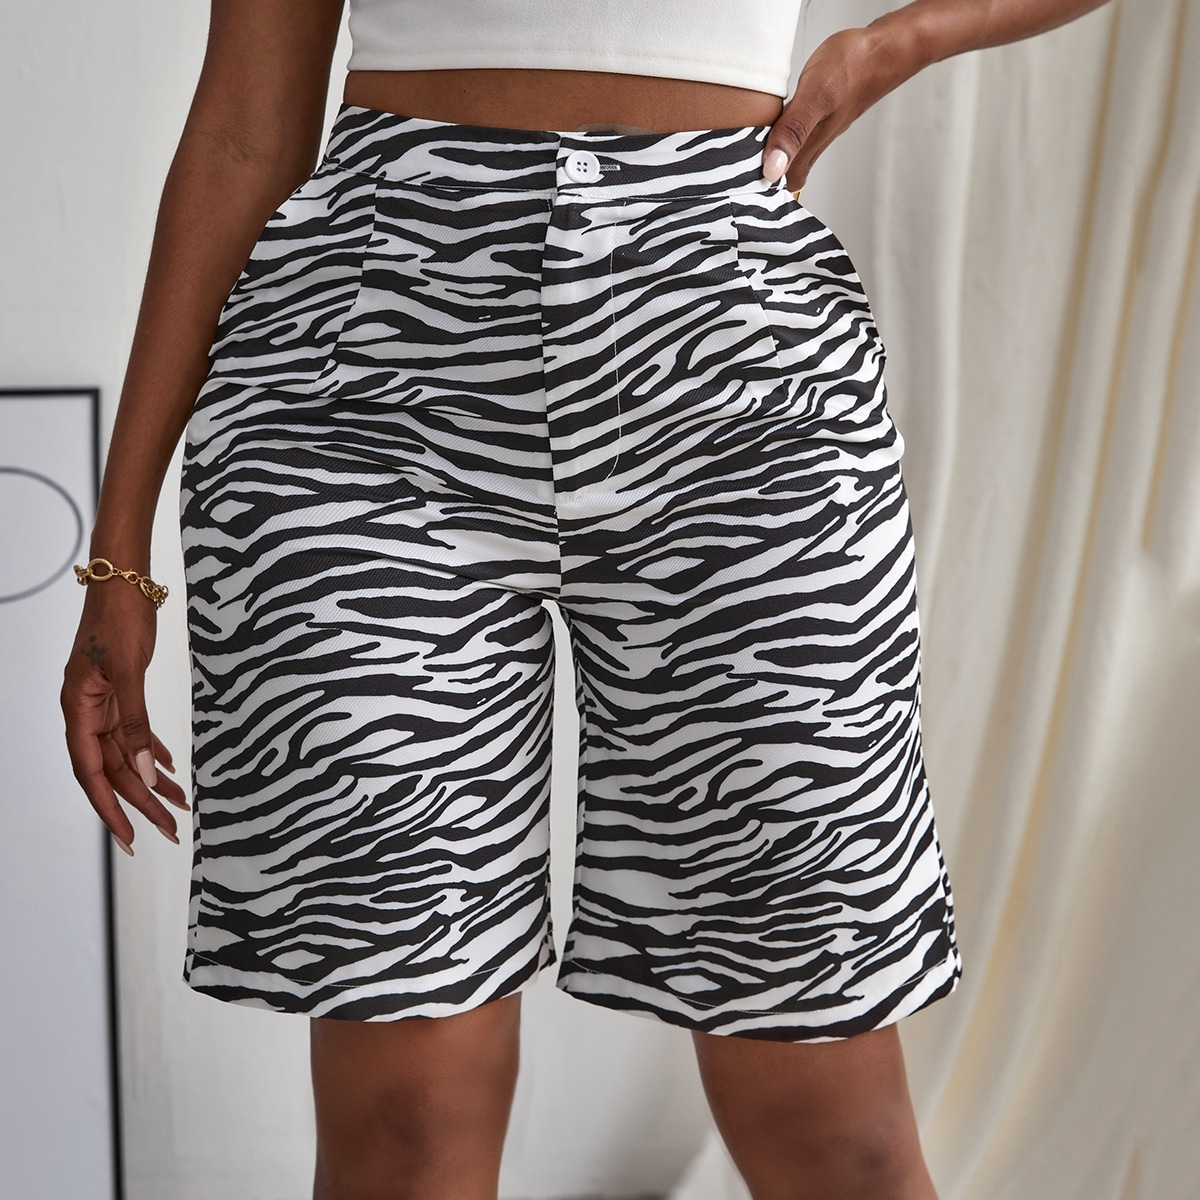 Fold Pleated Zebra Striped Shorts